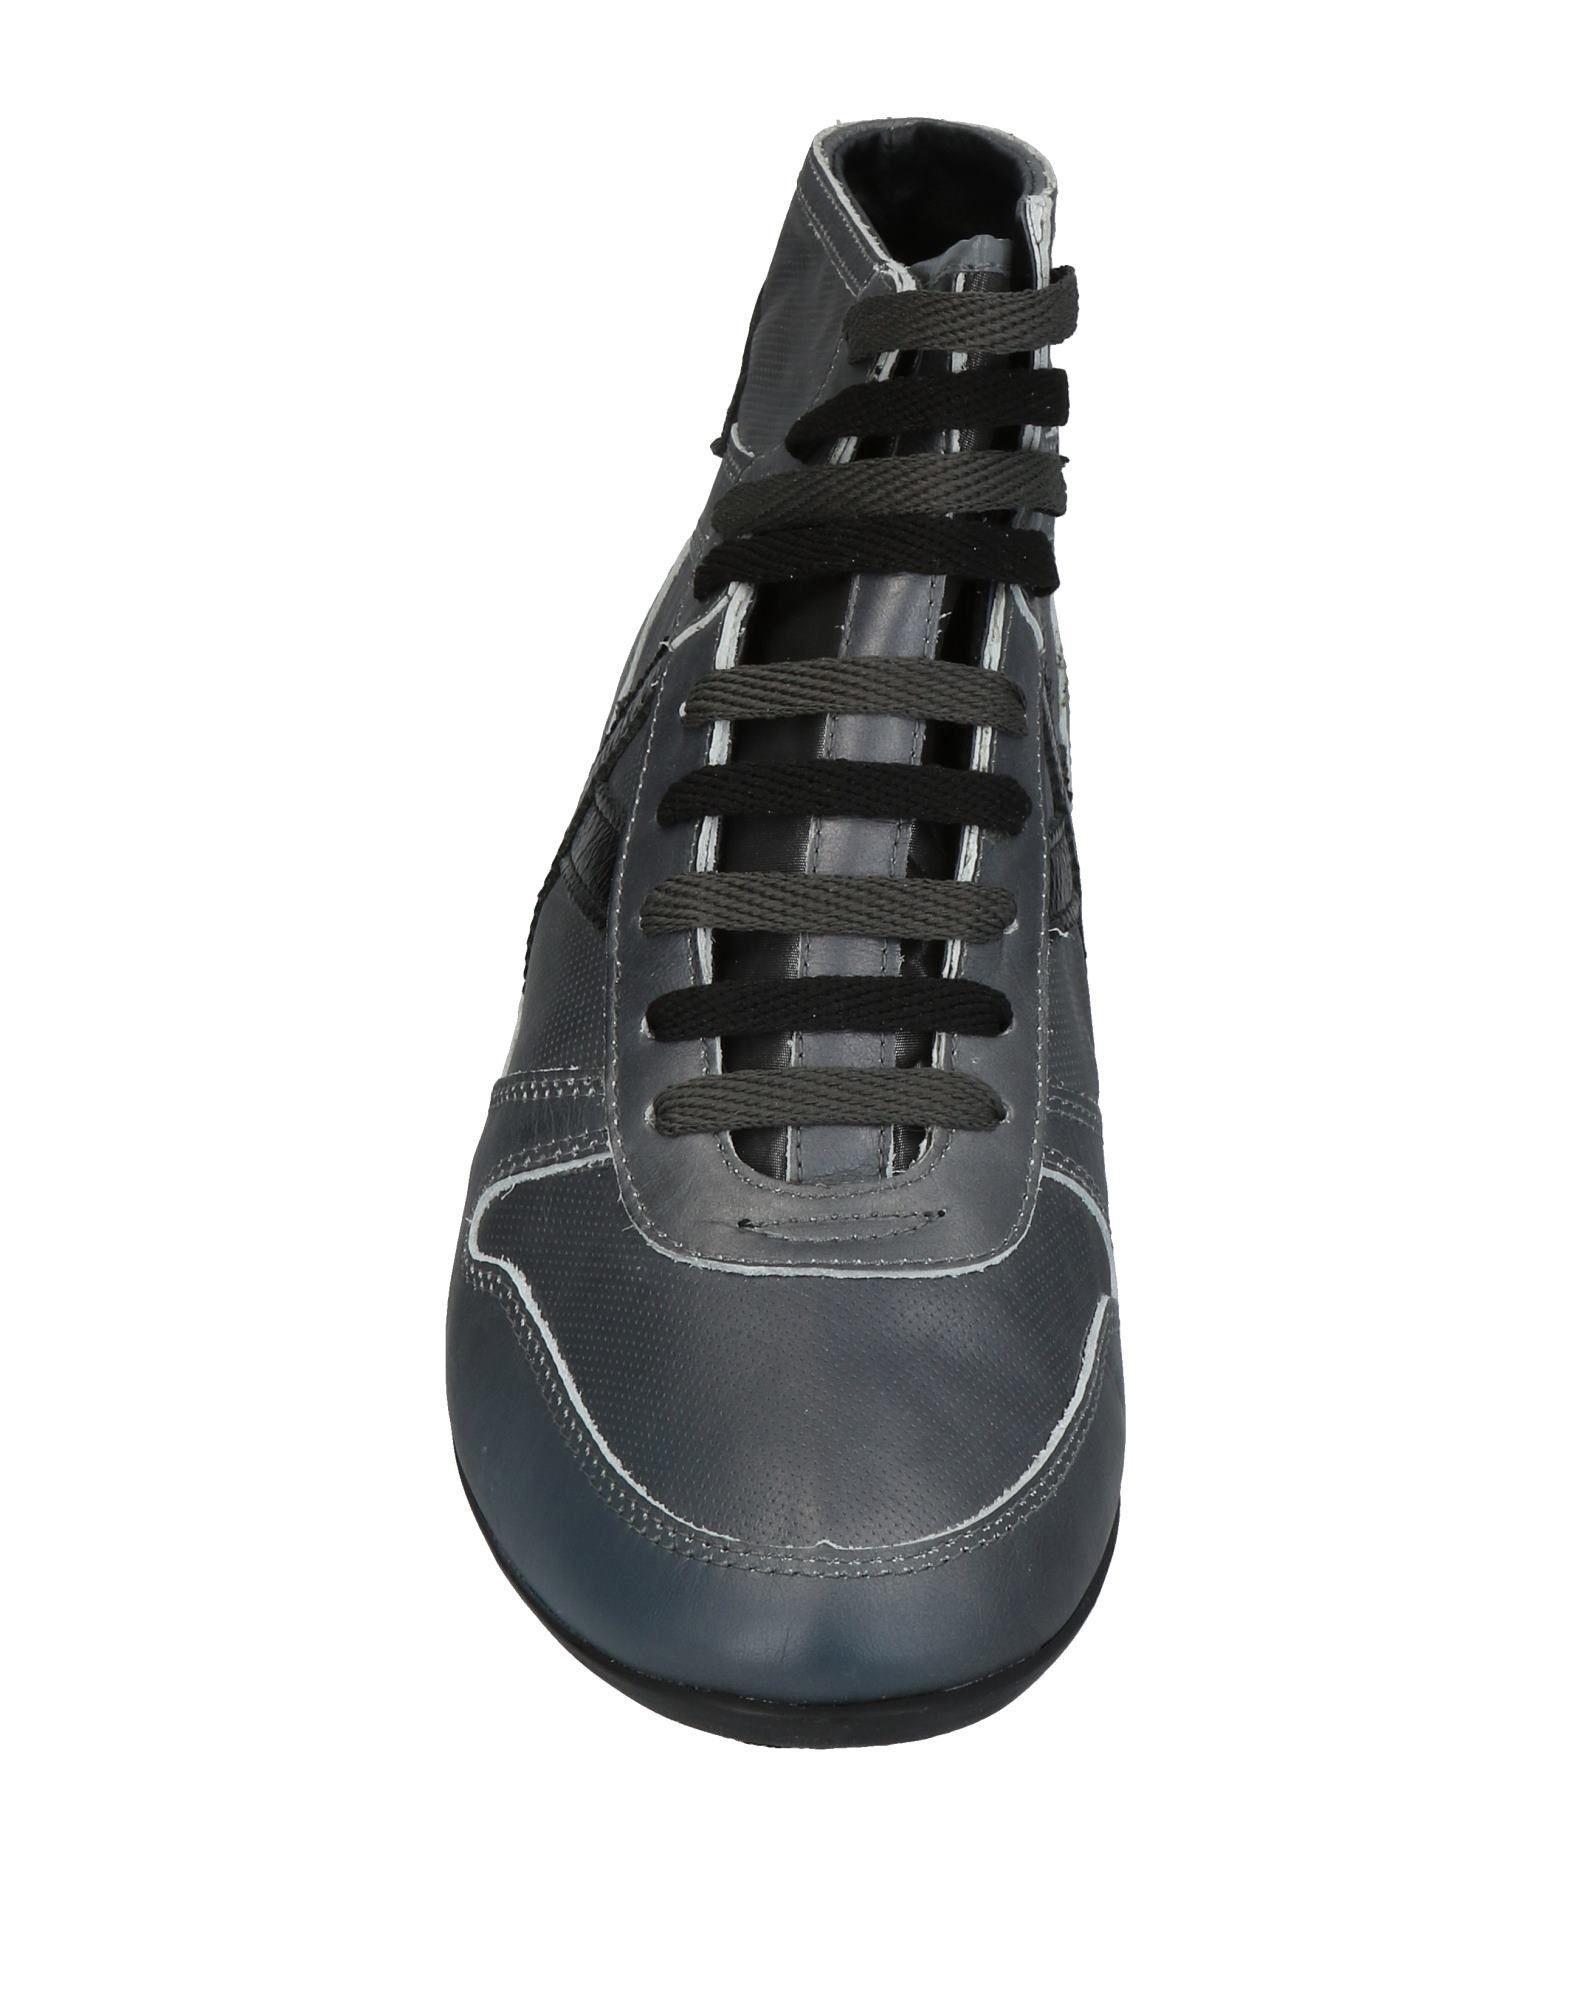 Rabatt echte Schuhe Herren Munich Sneakers Herren Schuhe  11446622EV 946a5a